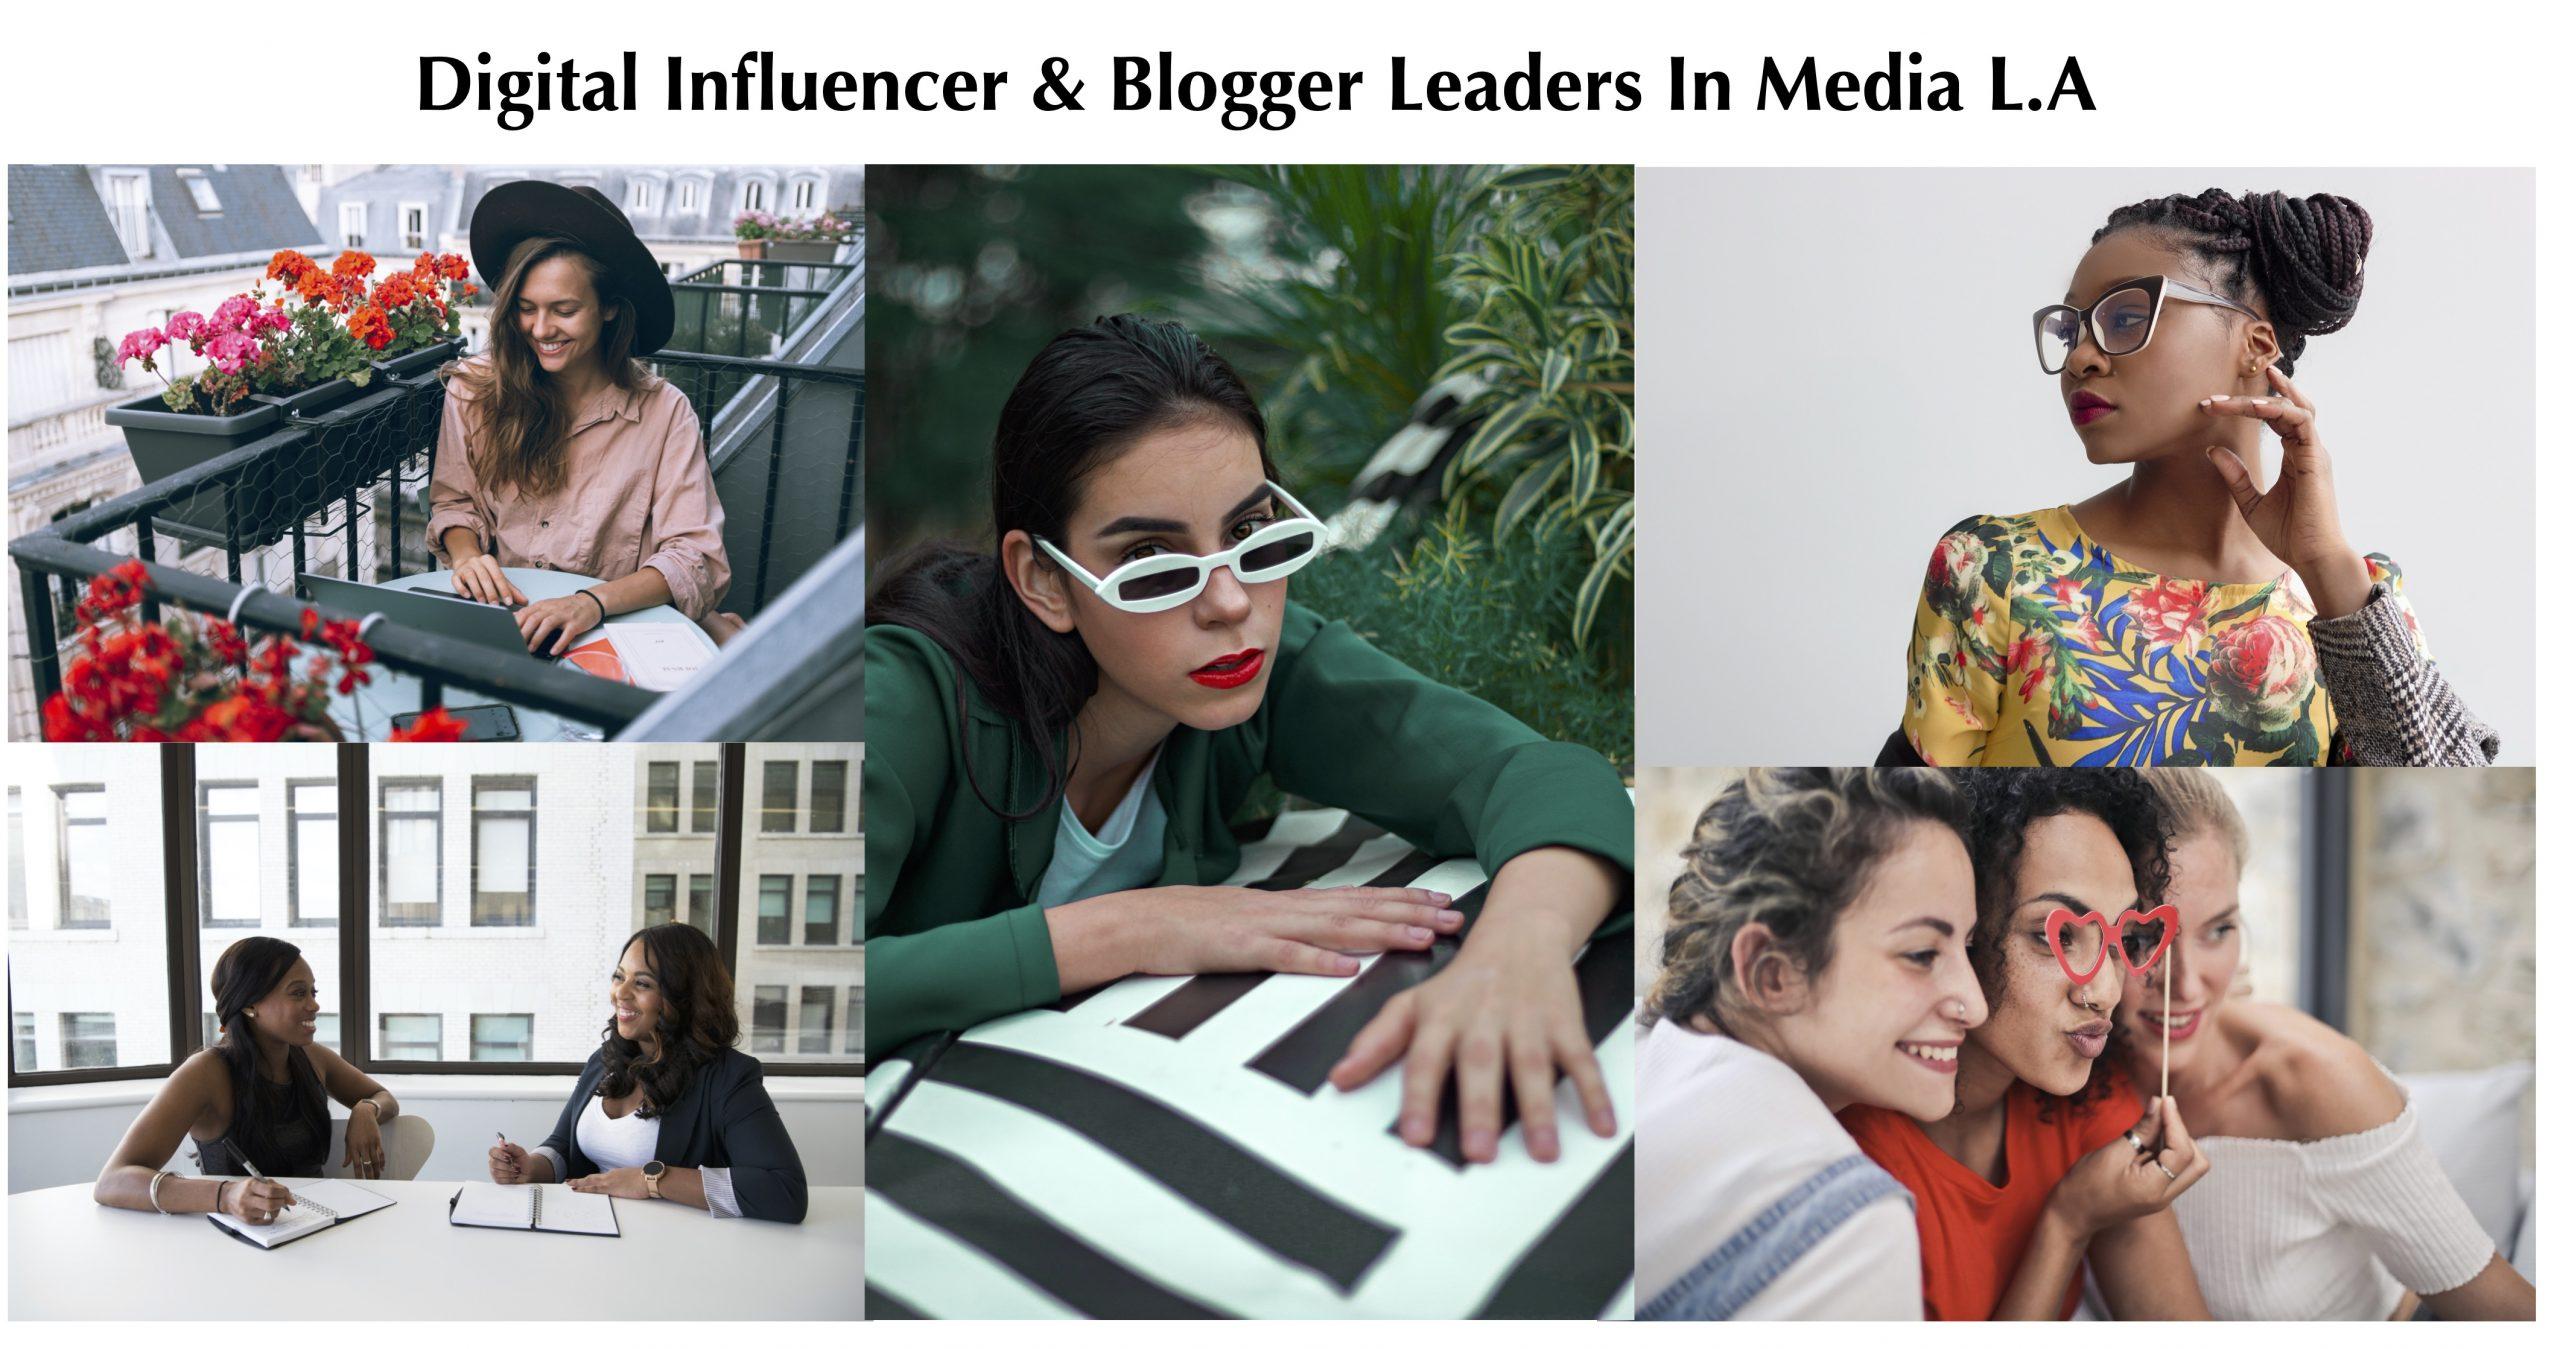 Digital Influencer & Blogger Leaders In Media Los Angeles